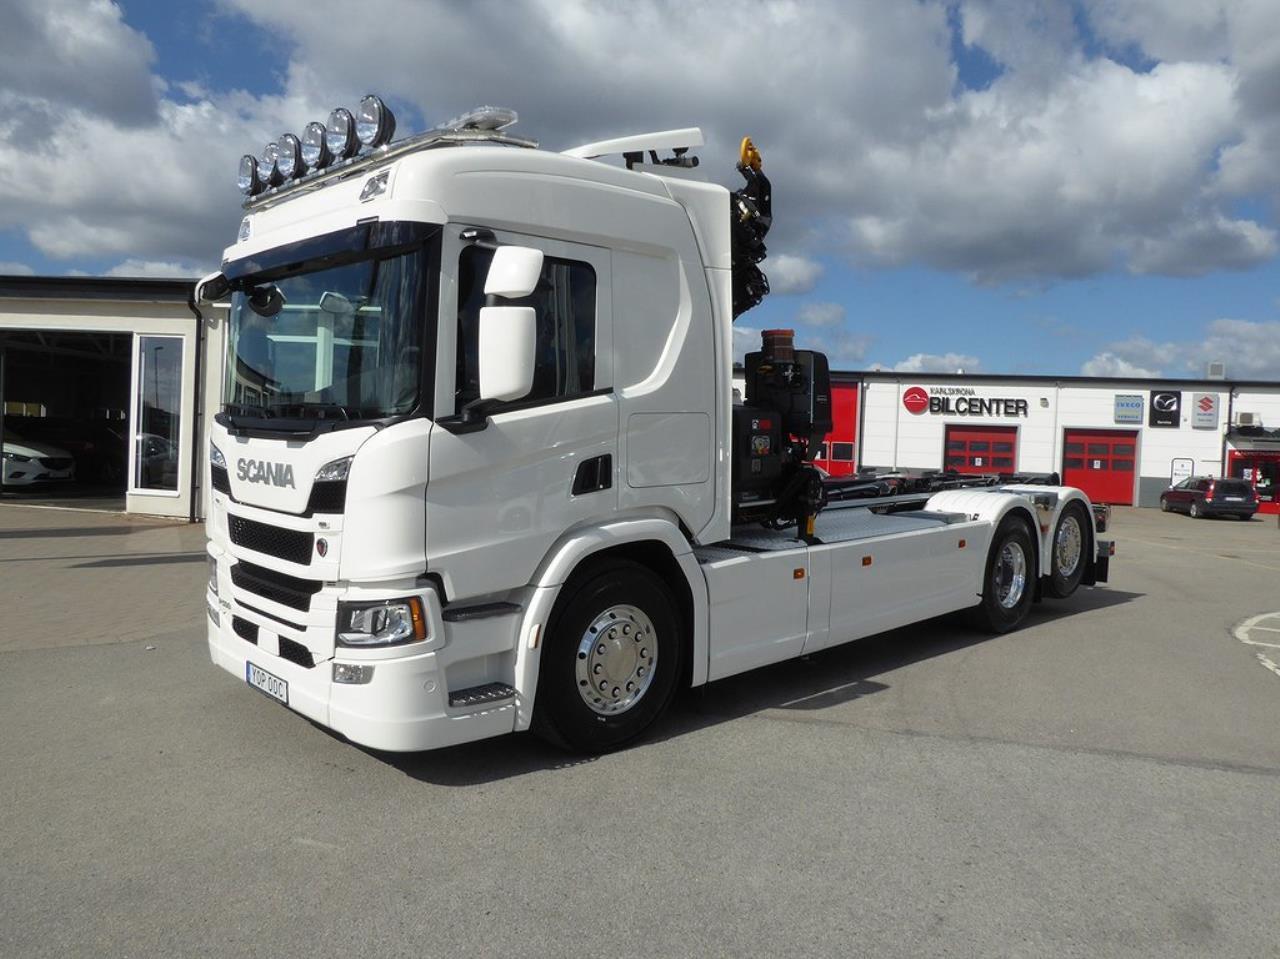 Scania G500 6x2*4 Kranväxlare  2021 - Krok/Lastväxlare